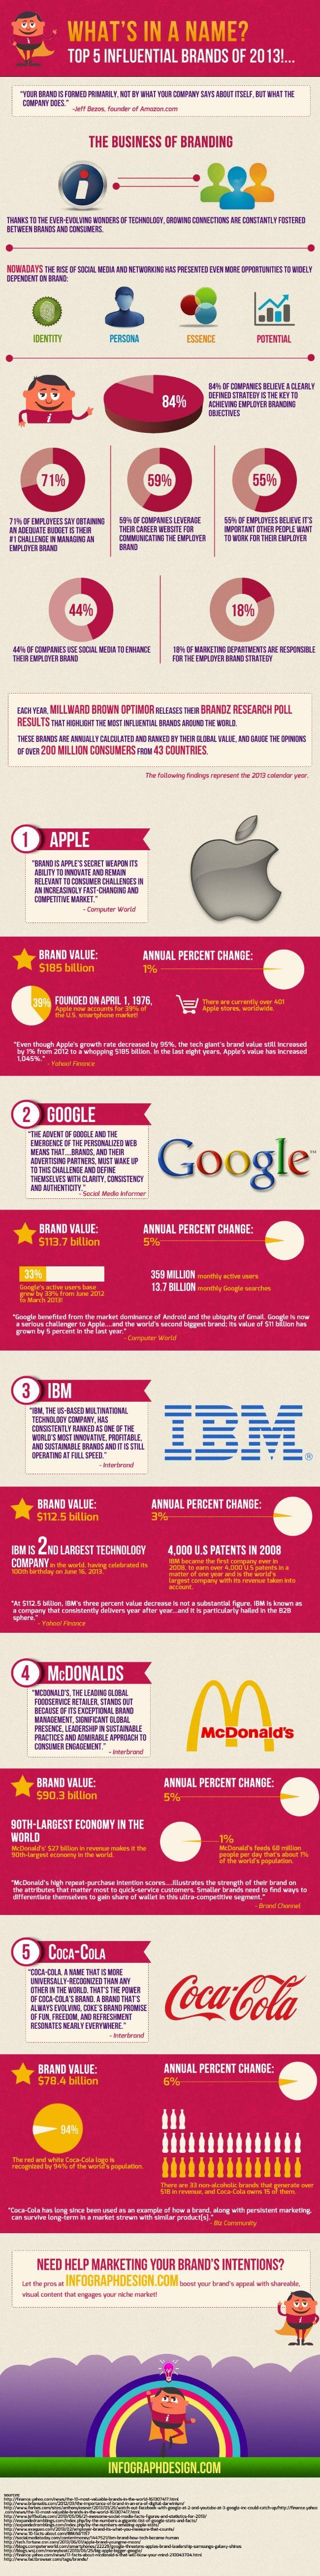 Les cinq marques les plus influentes en 2013